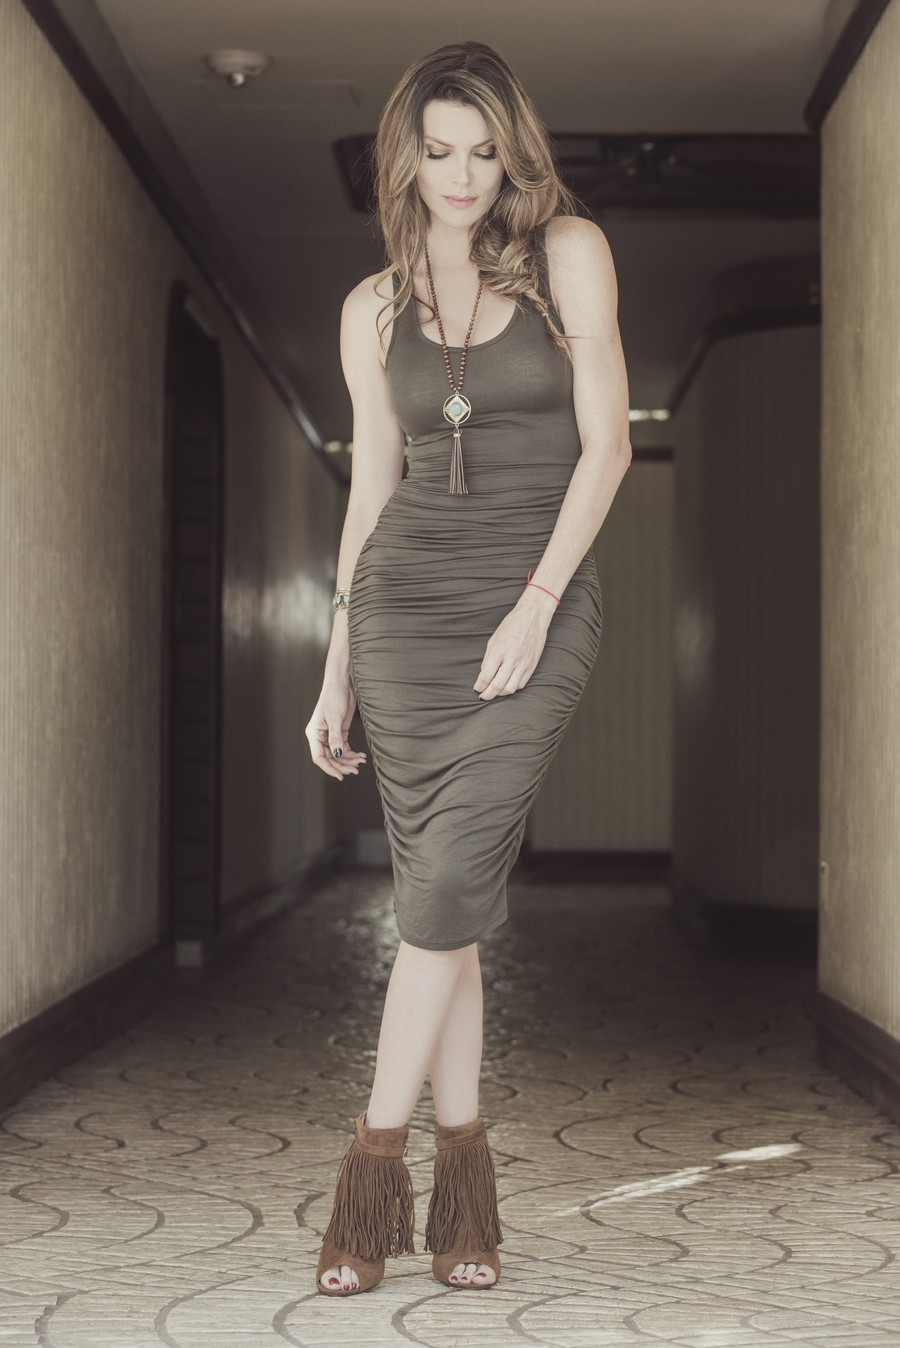 Conociendo a Maritza Rodríguez protagonista de «Silvana Sin Lana»